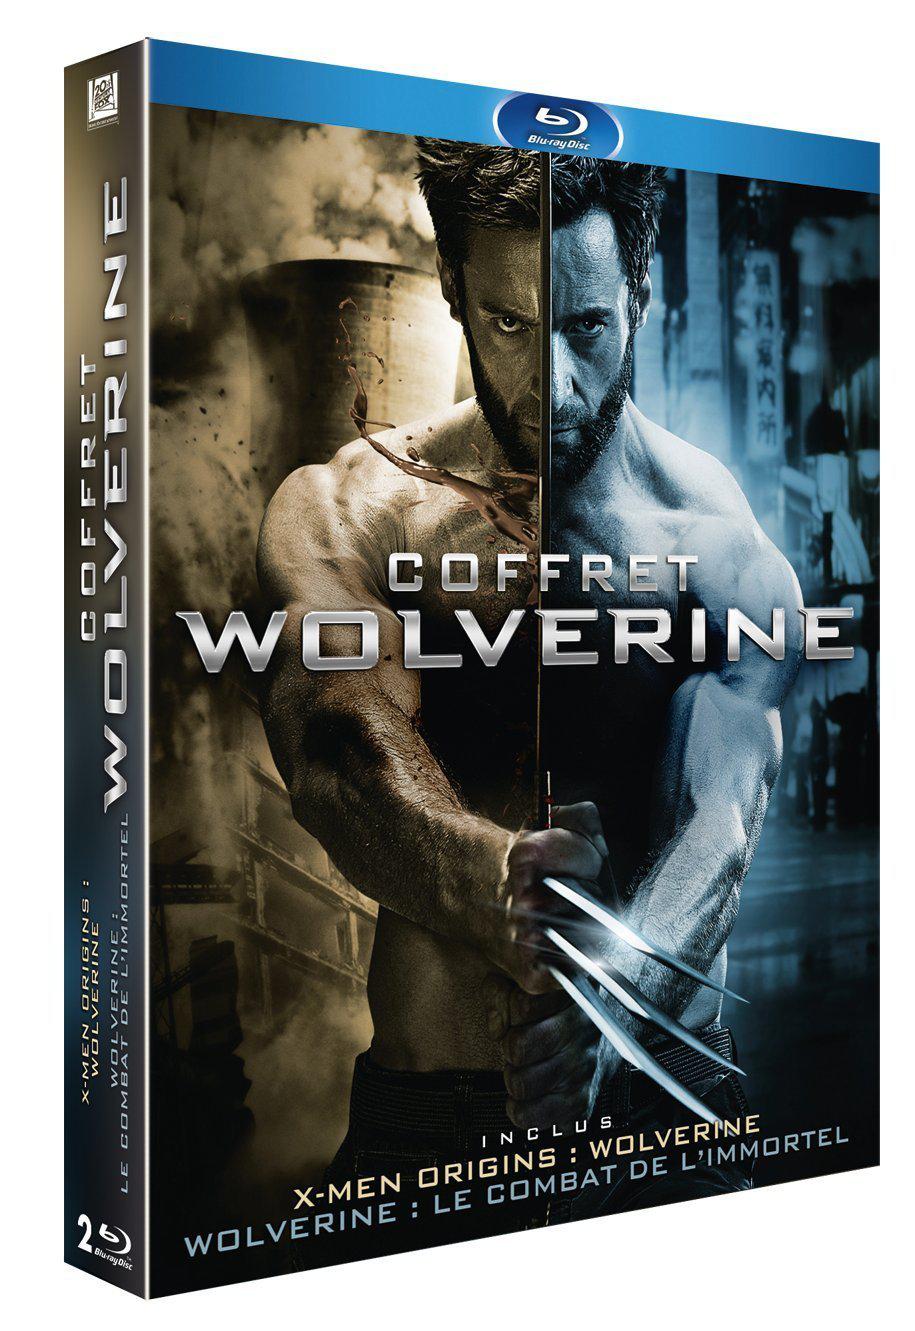 Coffret Wolverine : X-Men Origins: Wolverine + Wolverine : Le combat de l'immortel en Blu-ray